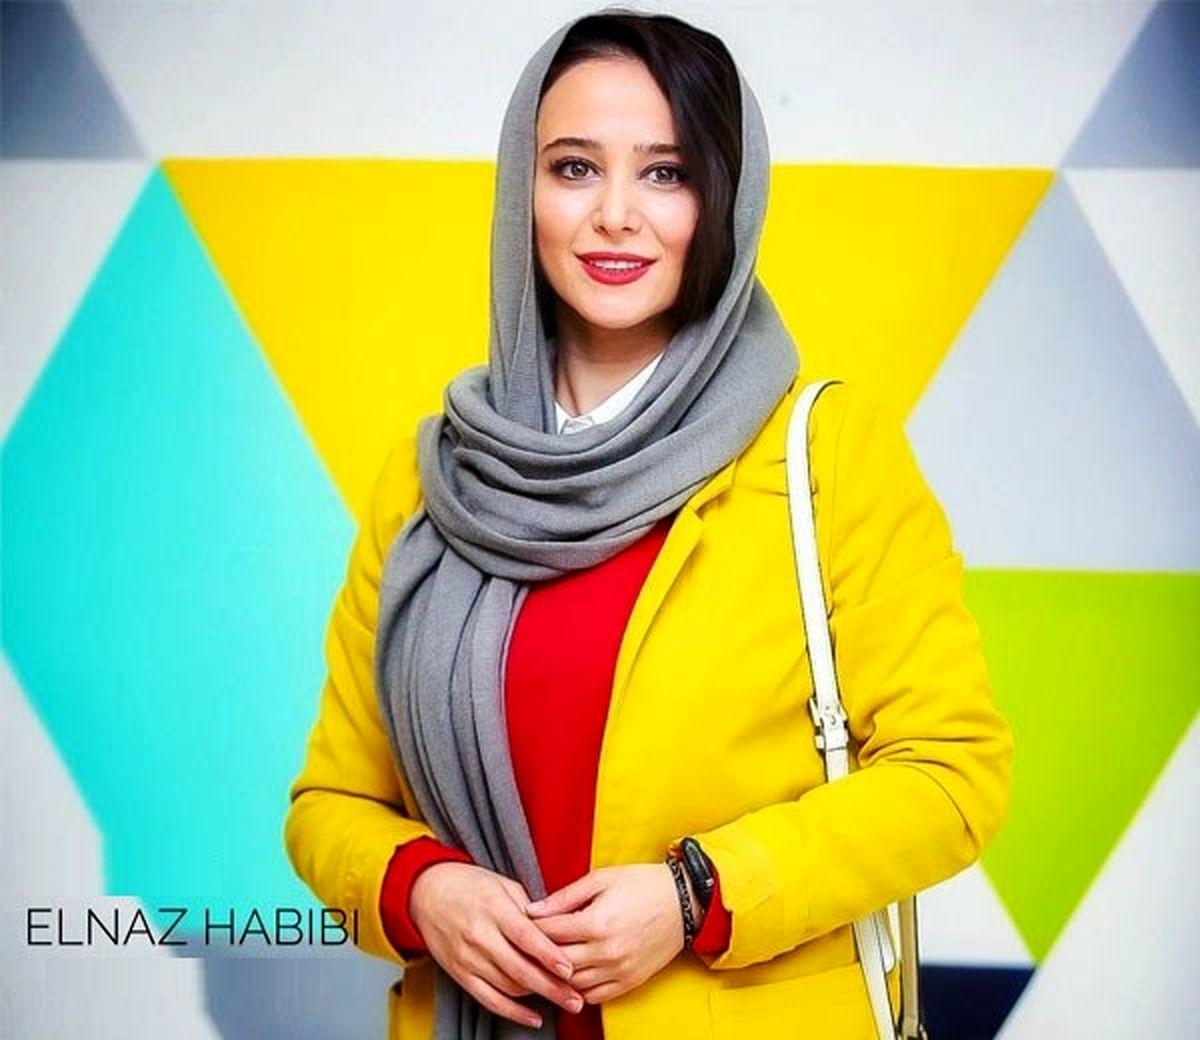 الناز حبیبی ازدواج کرد؟! + تصاویر